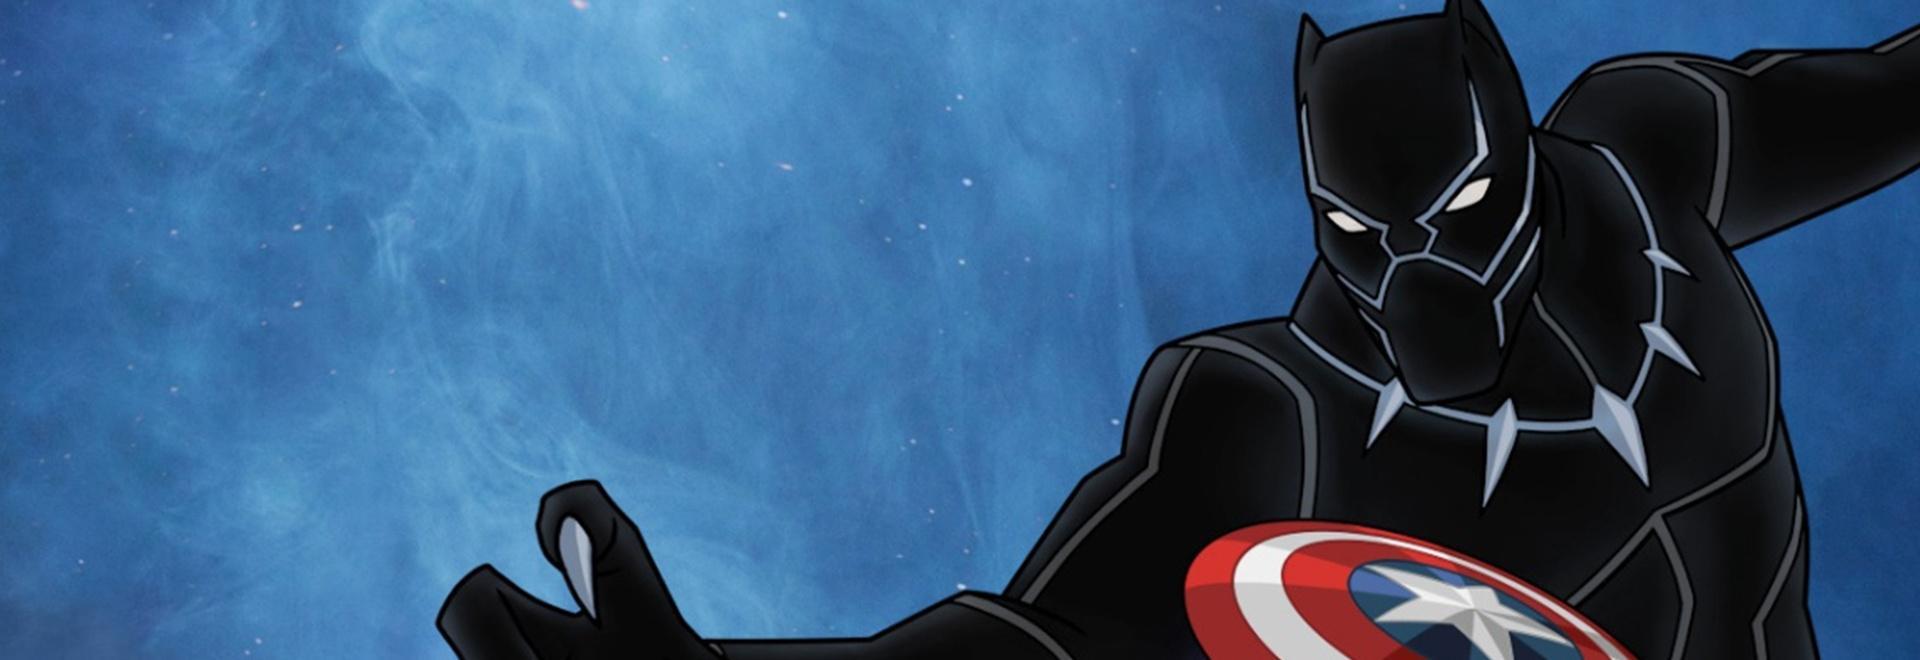 Marvel's Avengers: Black Panther